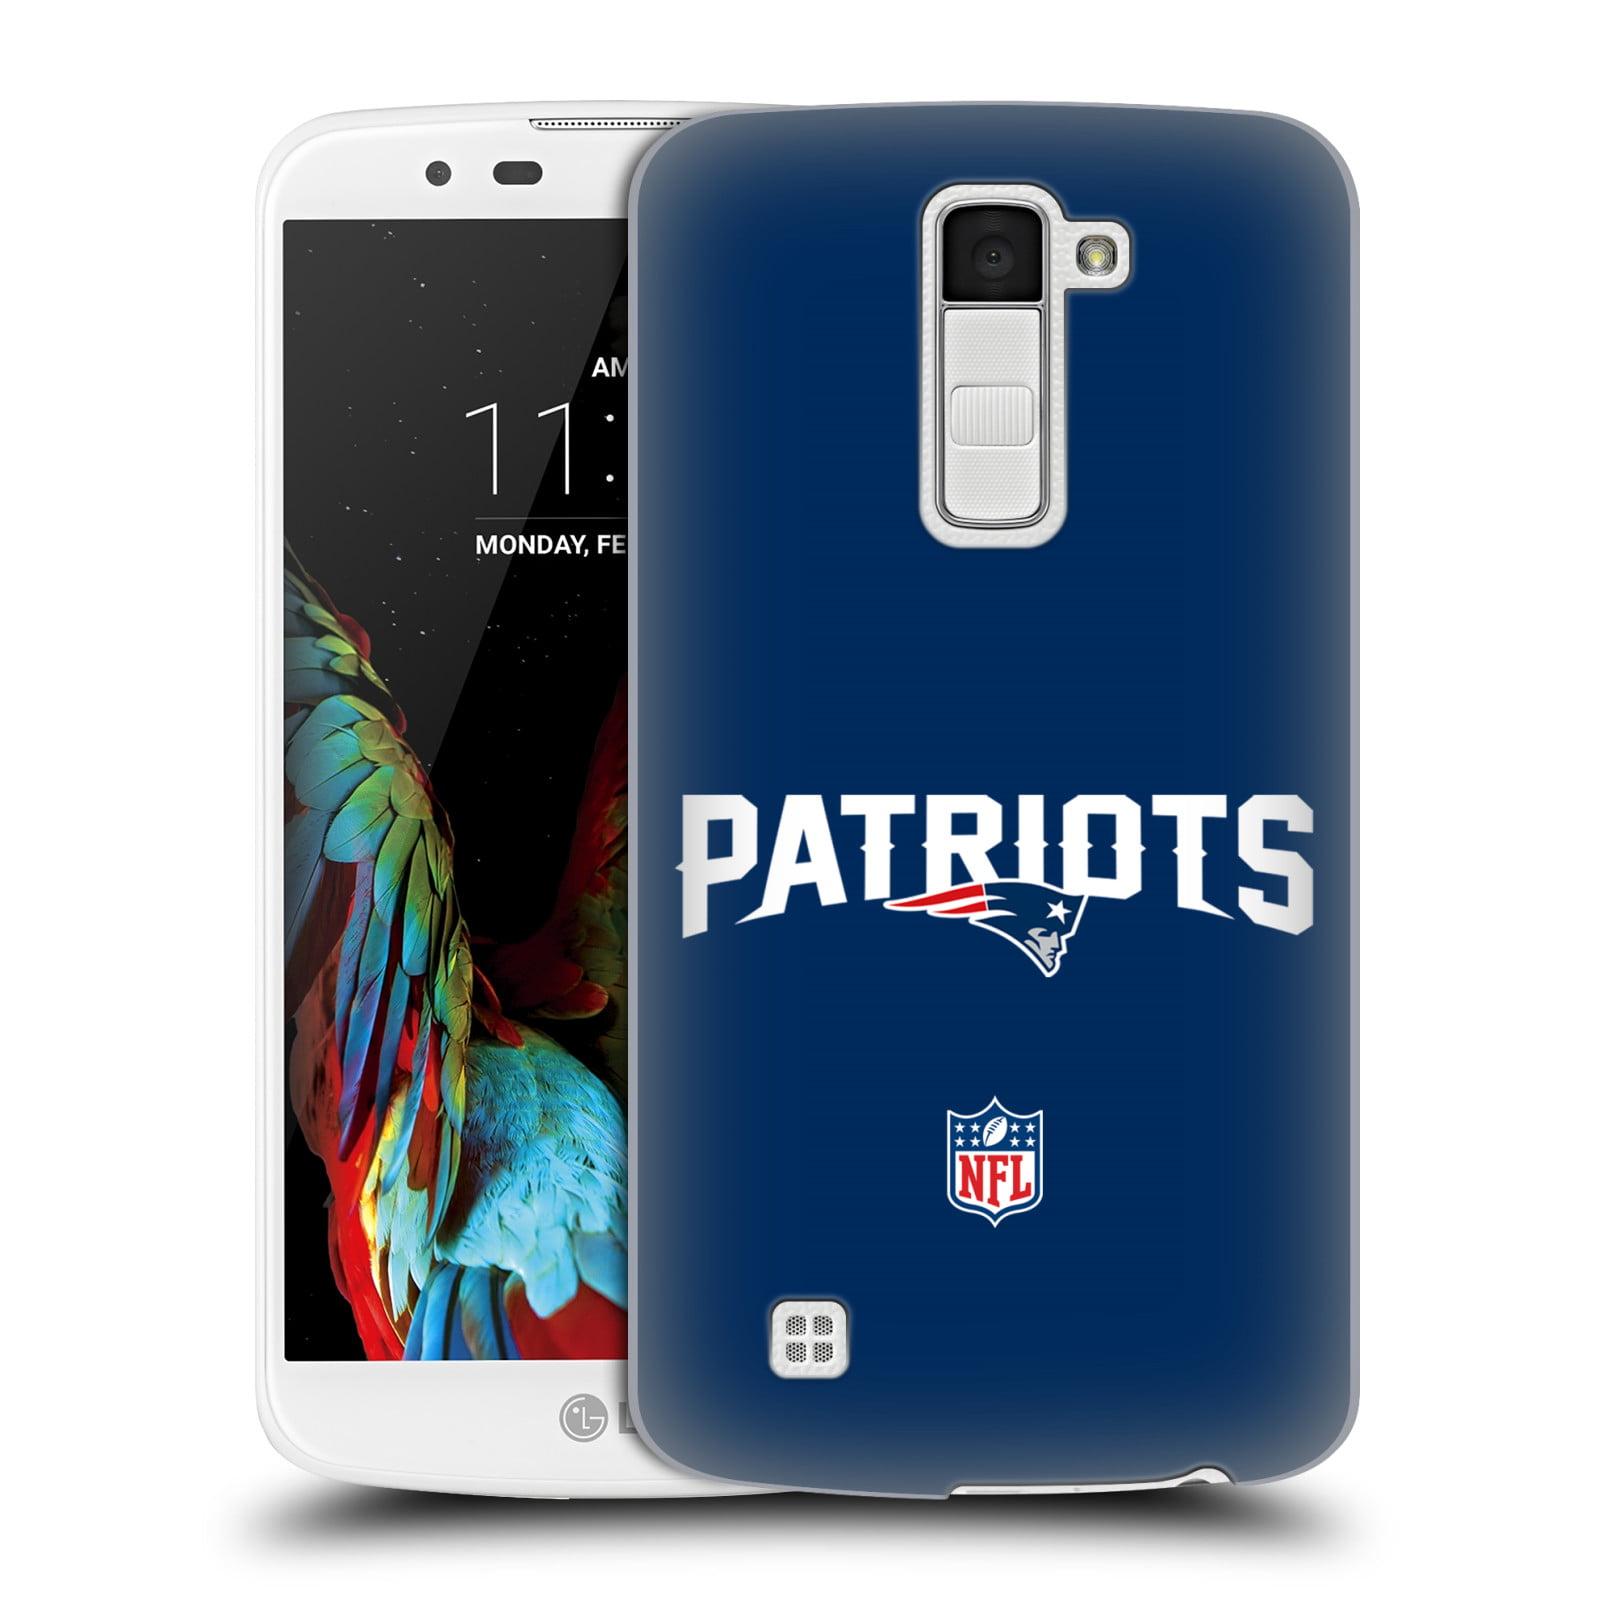 OFFICIAL NFL NEW ENGLAND PATRIOTS LOGO HARD BACK CASE FOR LG PHONES 3